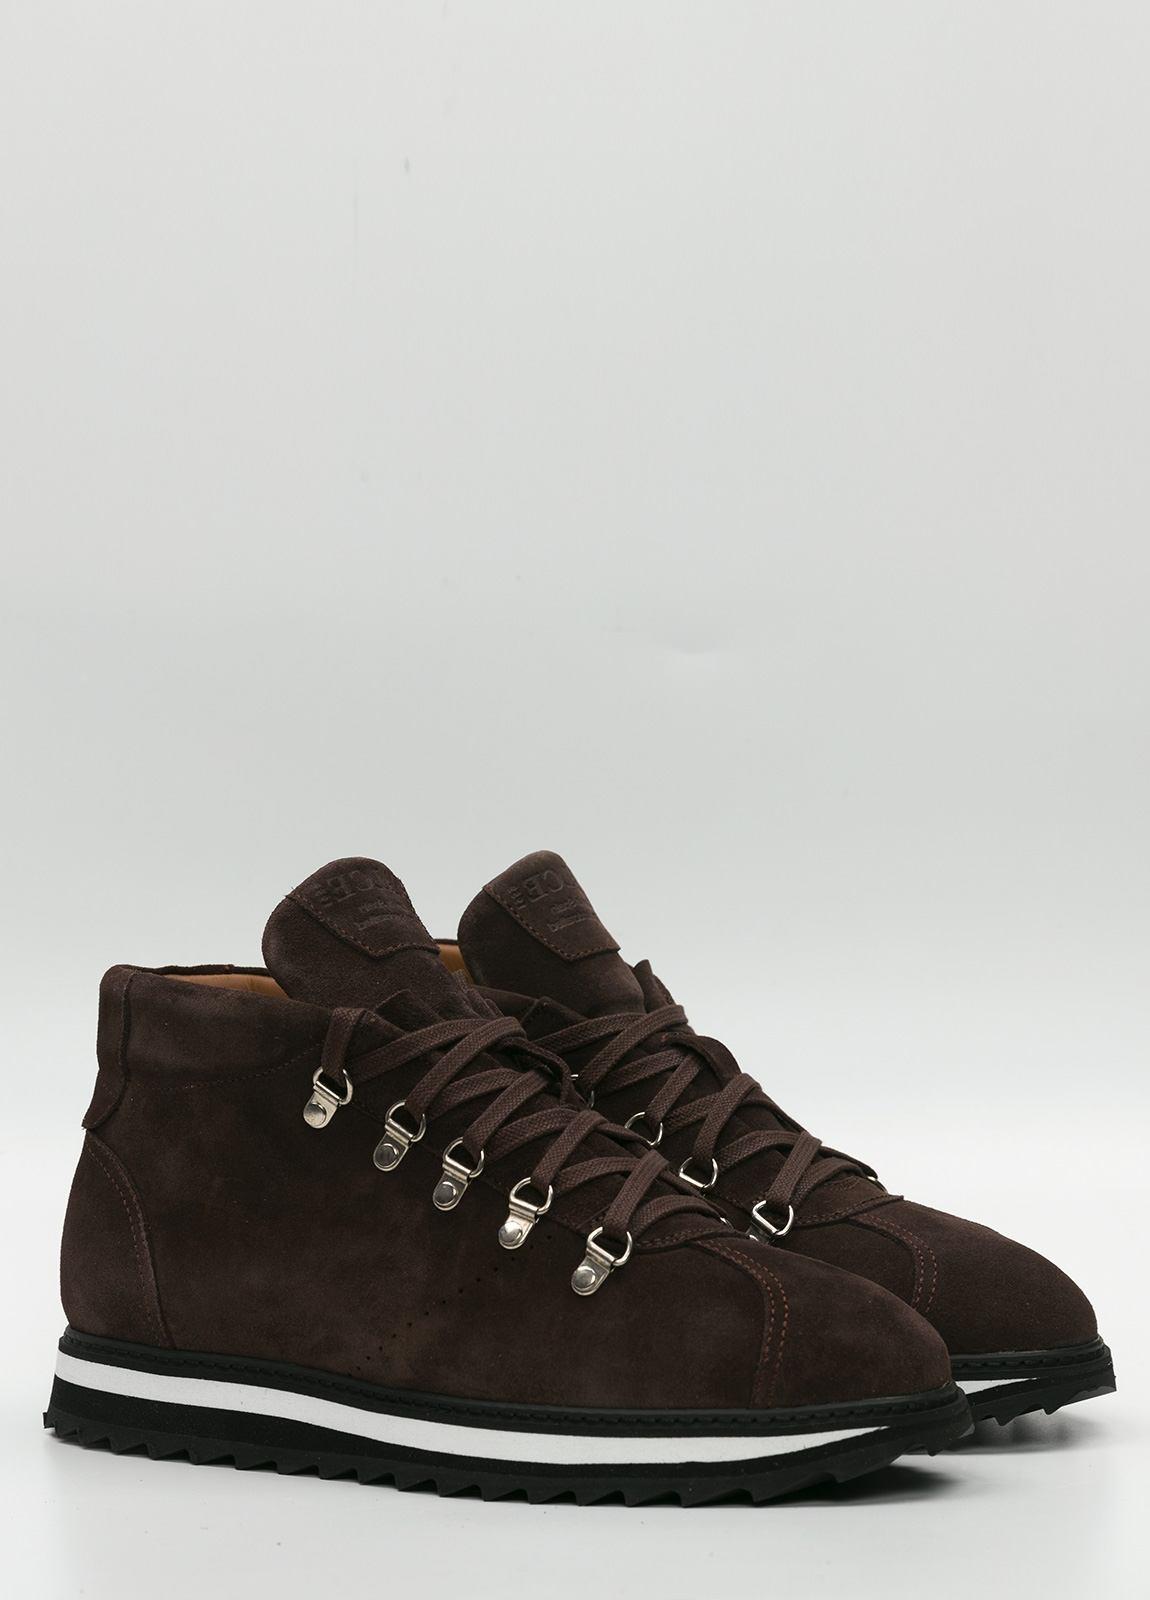 Bota sport de cordones, color marrón oscuro. 100% Piel Ante. - Ítem2